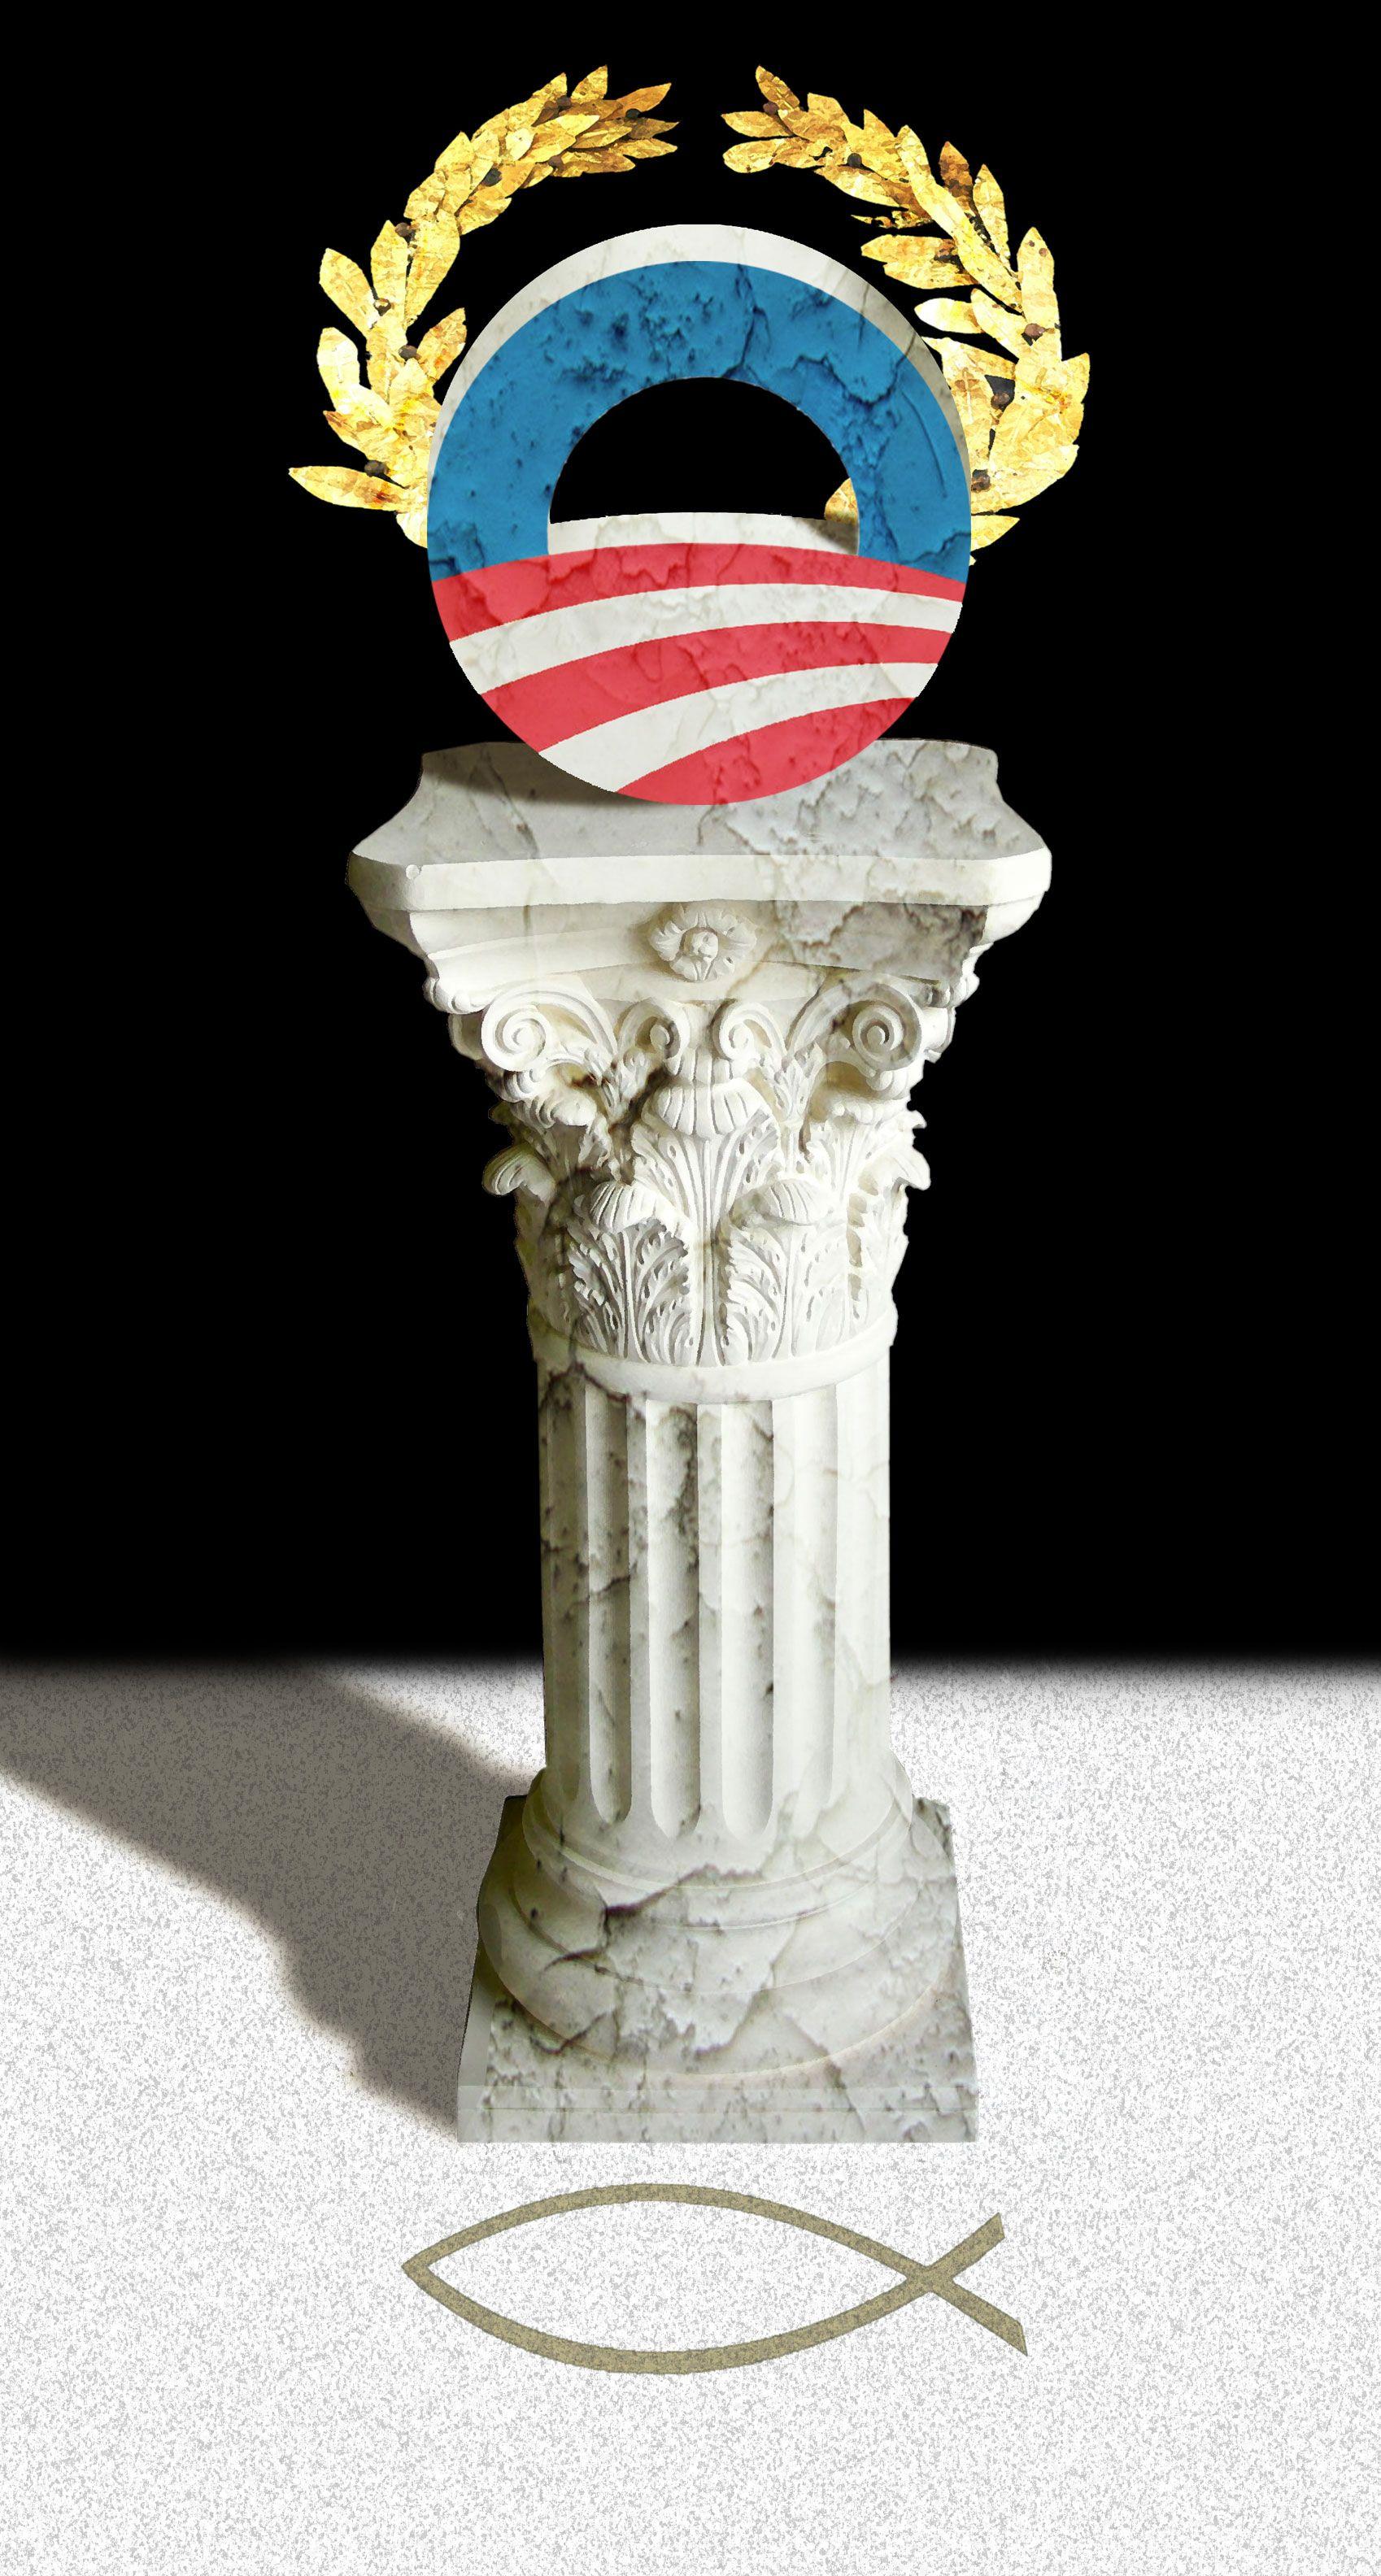 KING: Blacks should vote God's way — against Obama - Washington Times